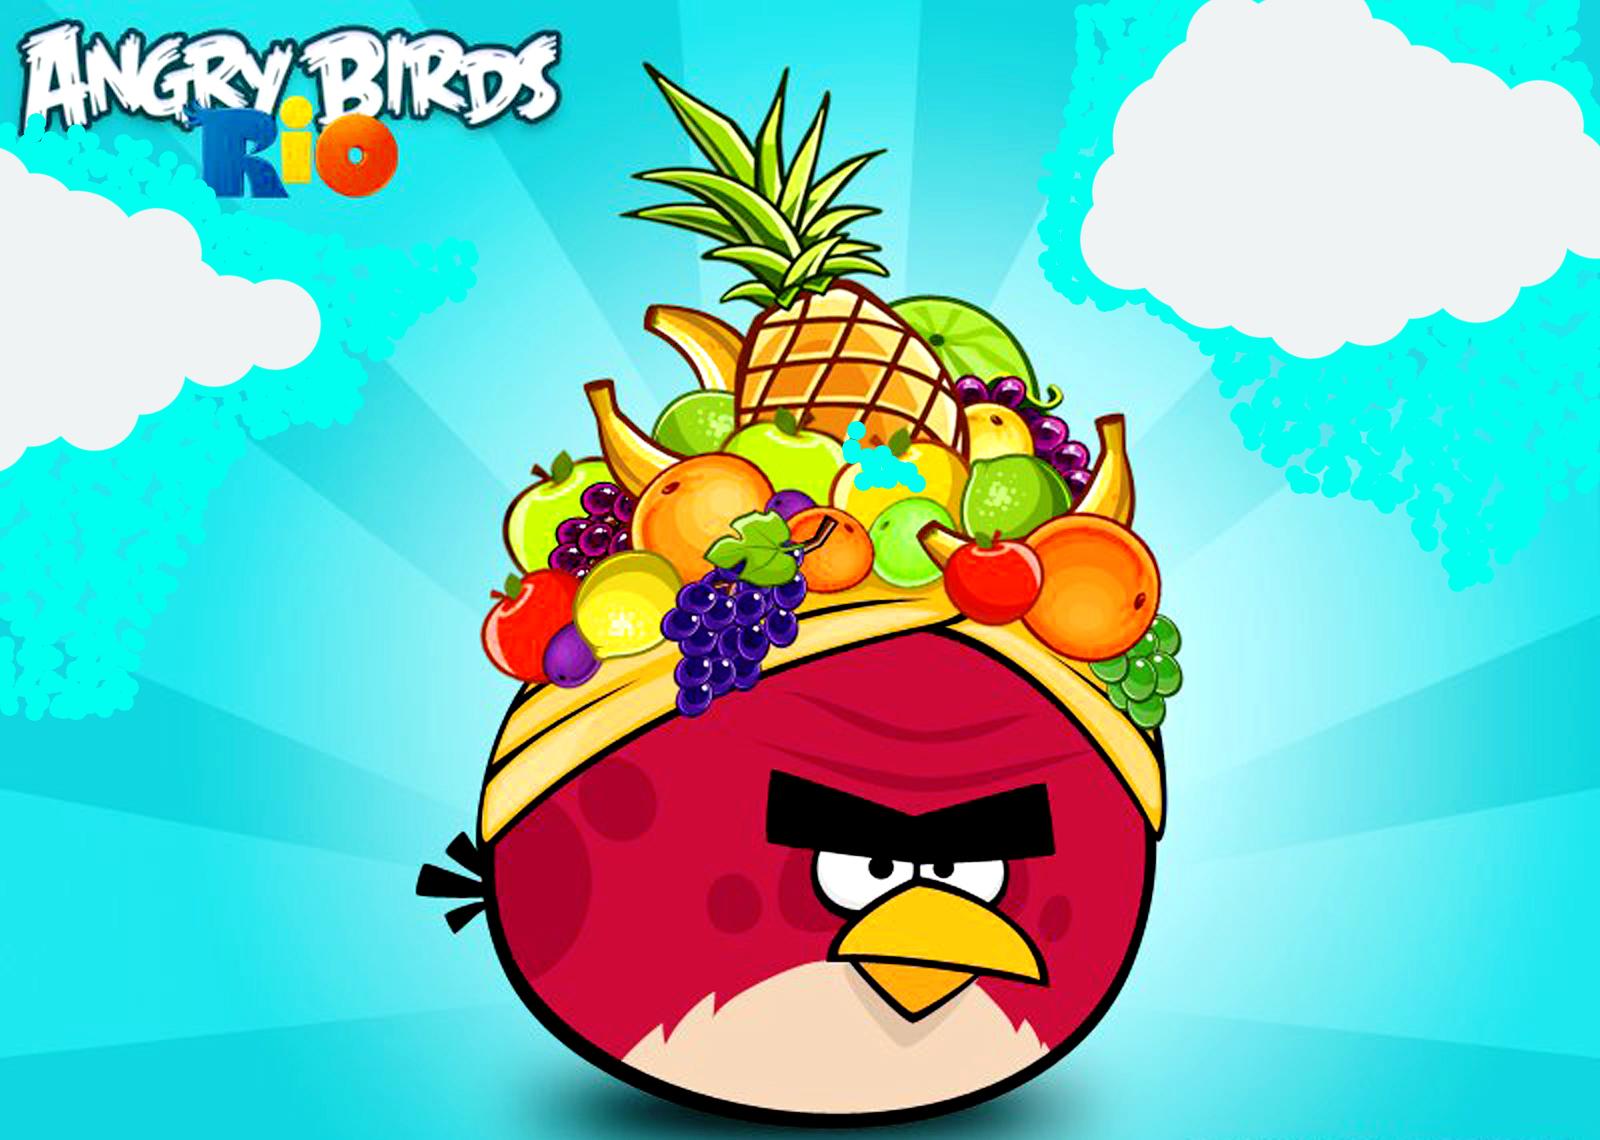 http://3.bp.blogspot.com/-kdUM9juy7DY/TnnyXa-2y5I/AAAAAAAADPI/-QHJ9Q7E8fI/s1600/Angry_Birds_Rio_HD_Wallpaper_Vvallpaper.Net.jpg